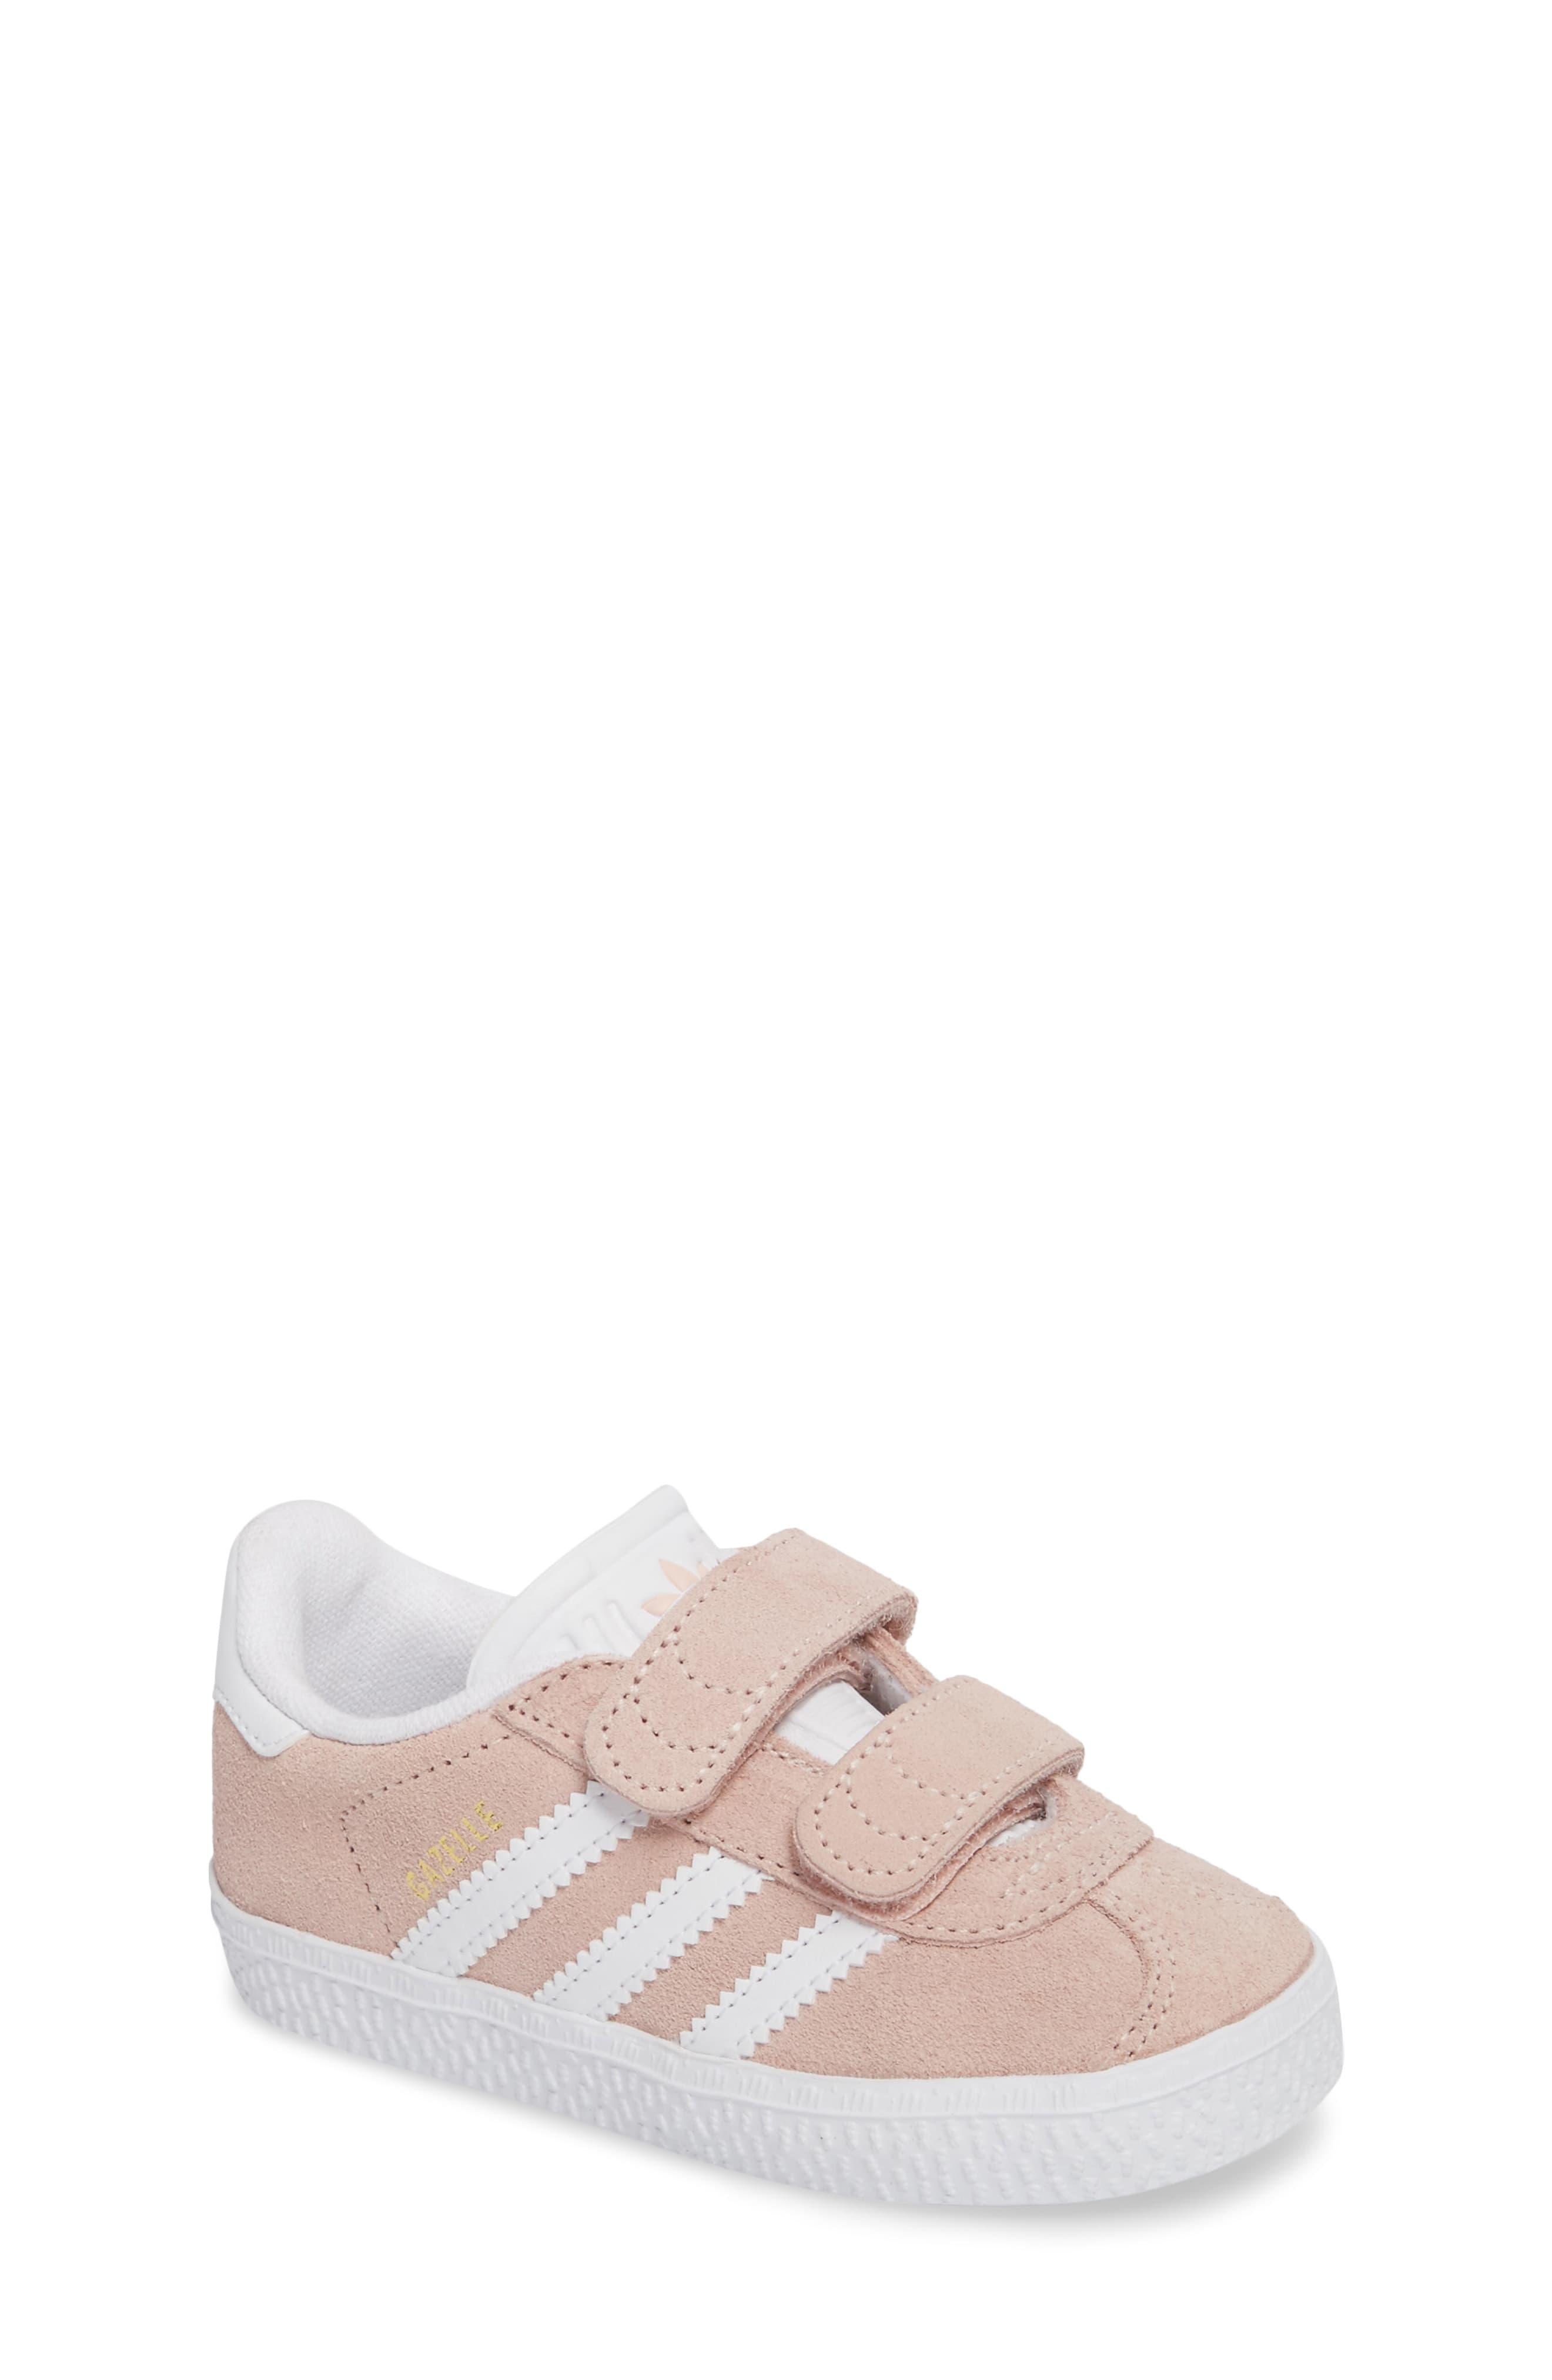 Zapatos 2018 estilo clásico rebajas Toddler Girl's Adidas Gazelle Sneaker, Size 10 M - Pink | Sneakers ...